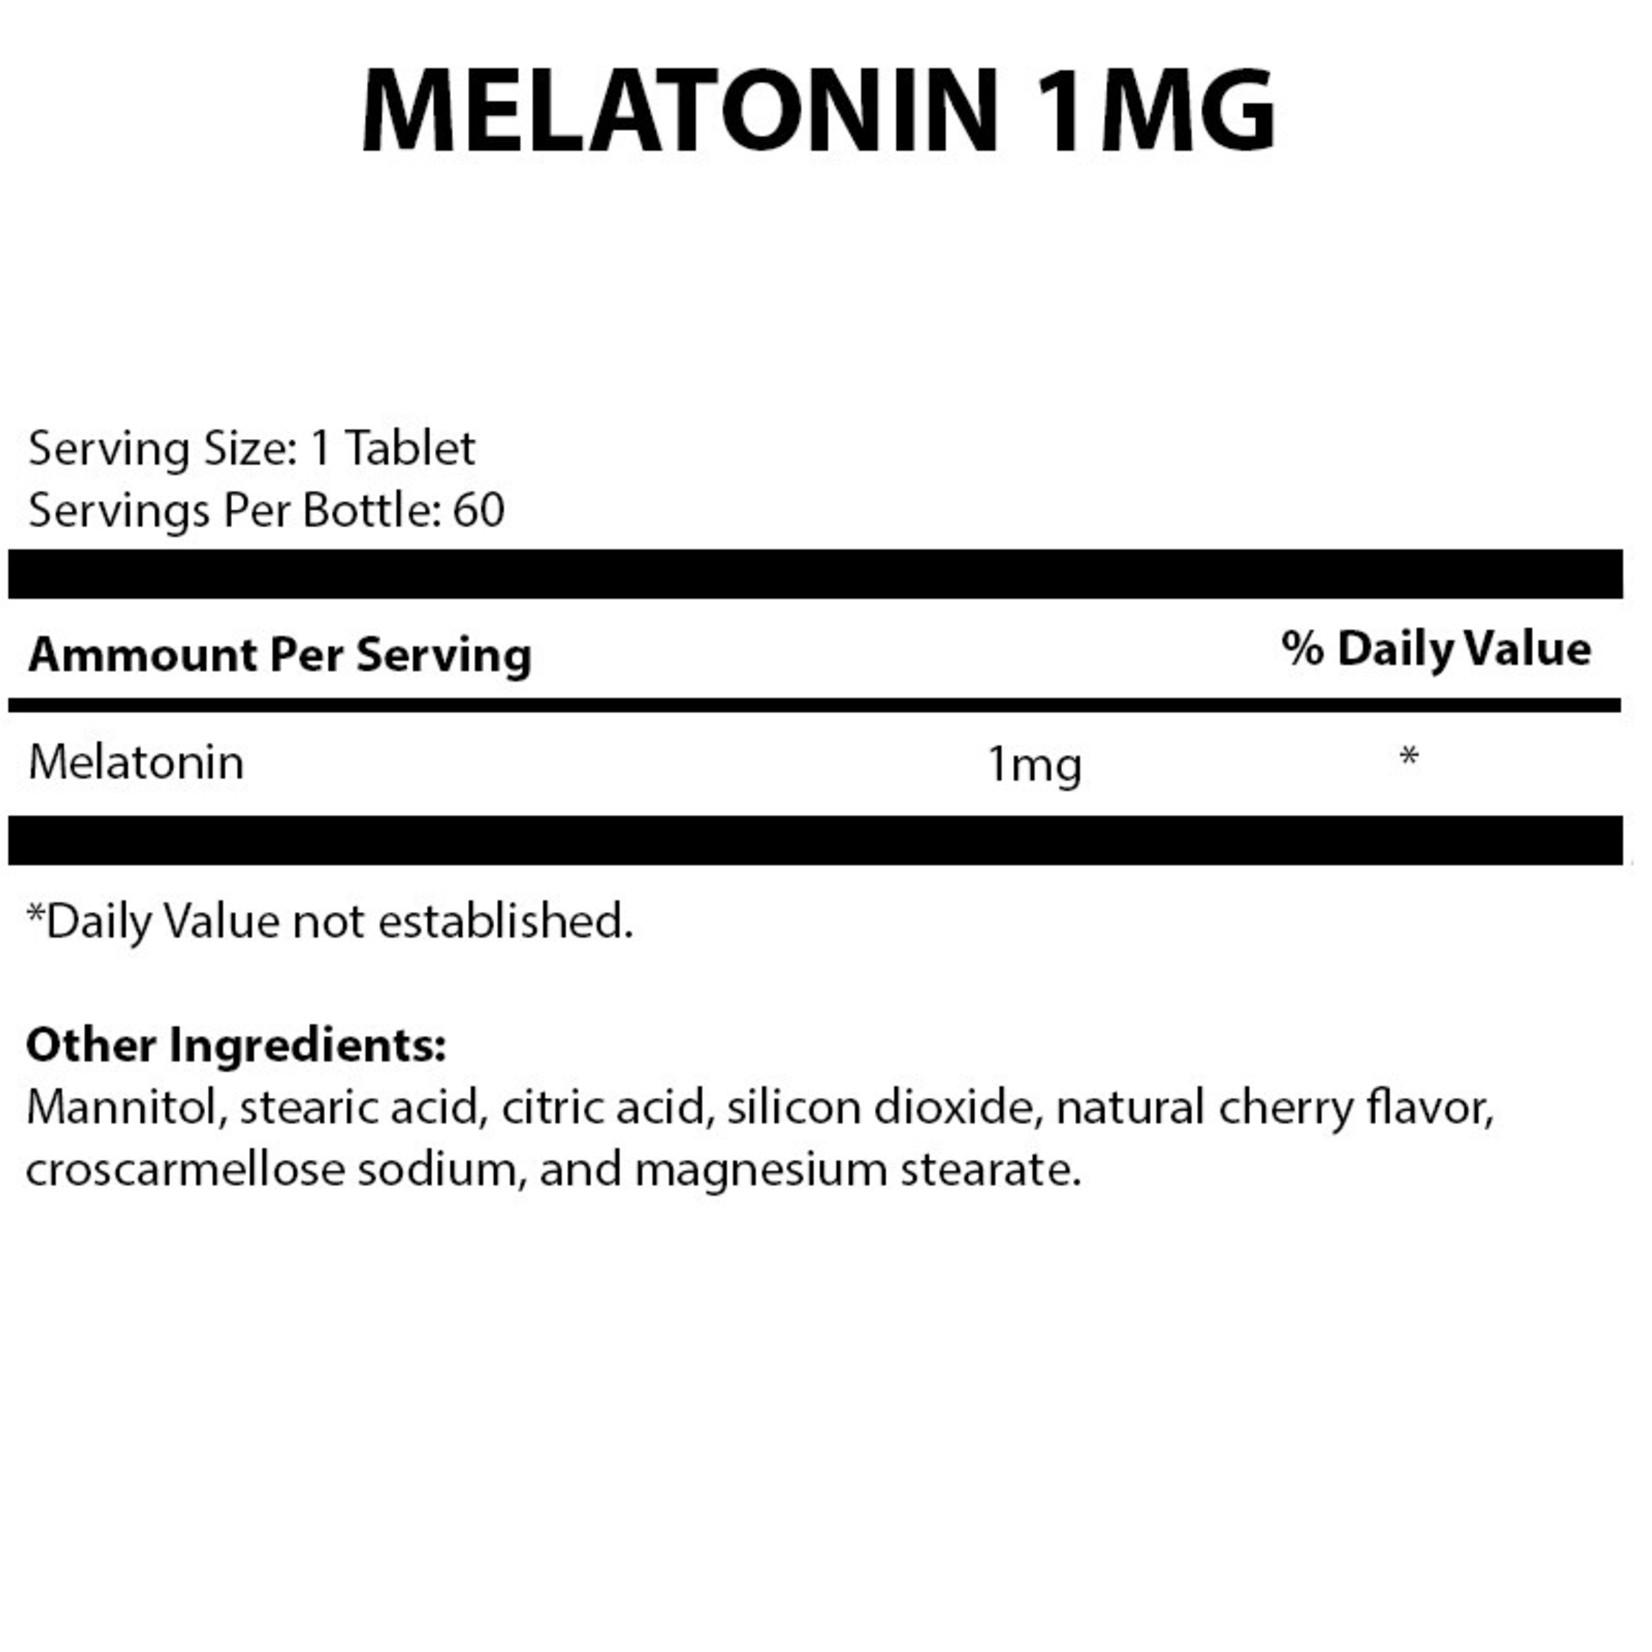 Alpine Clinic Private Label Melatonin - 1mg - Cherry